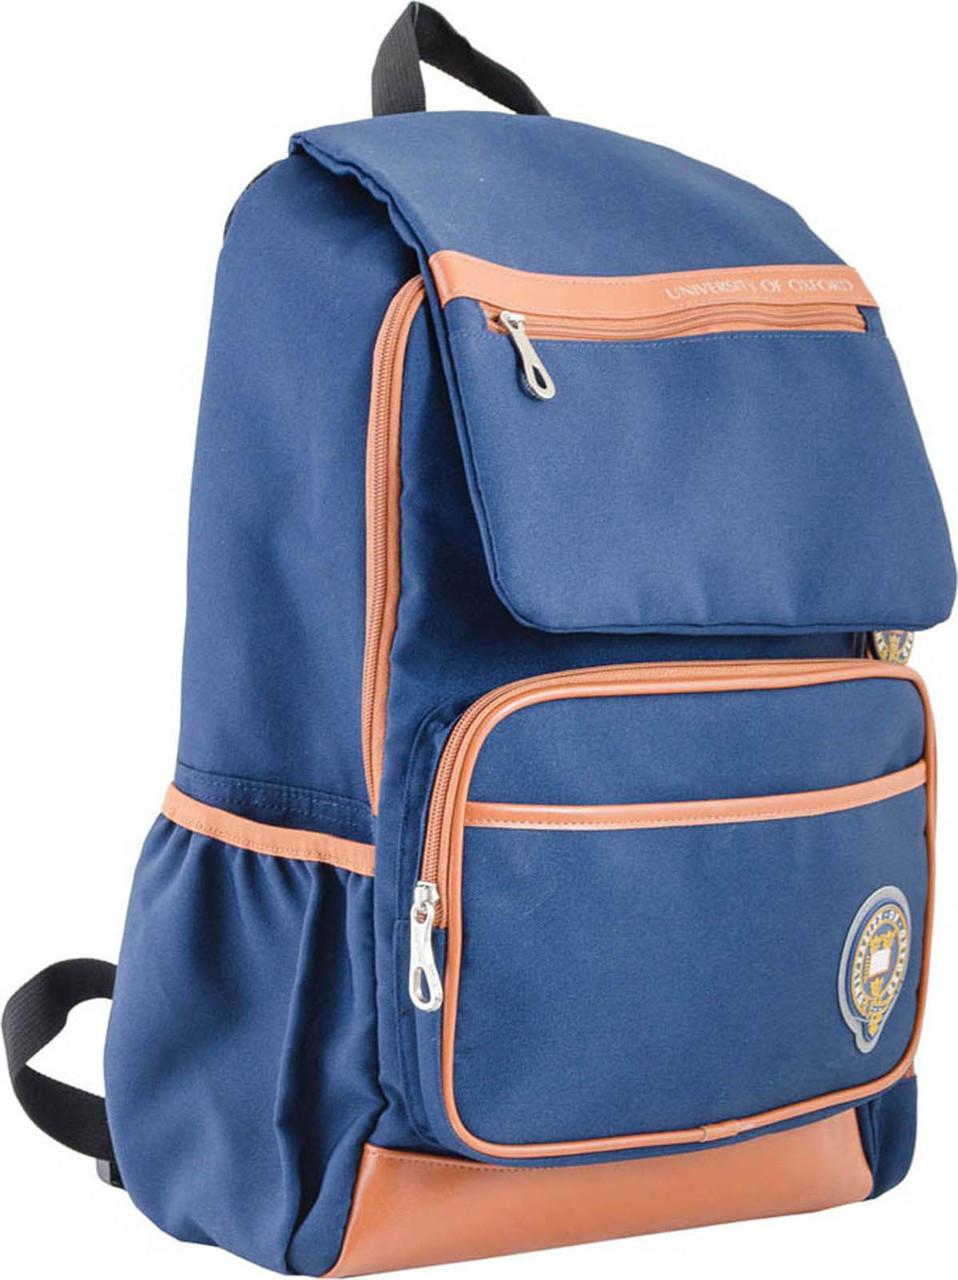 Рюкзак подростковый OX 293, синий, 28.5*44.5*12.5